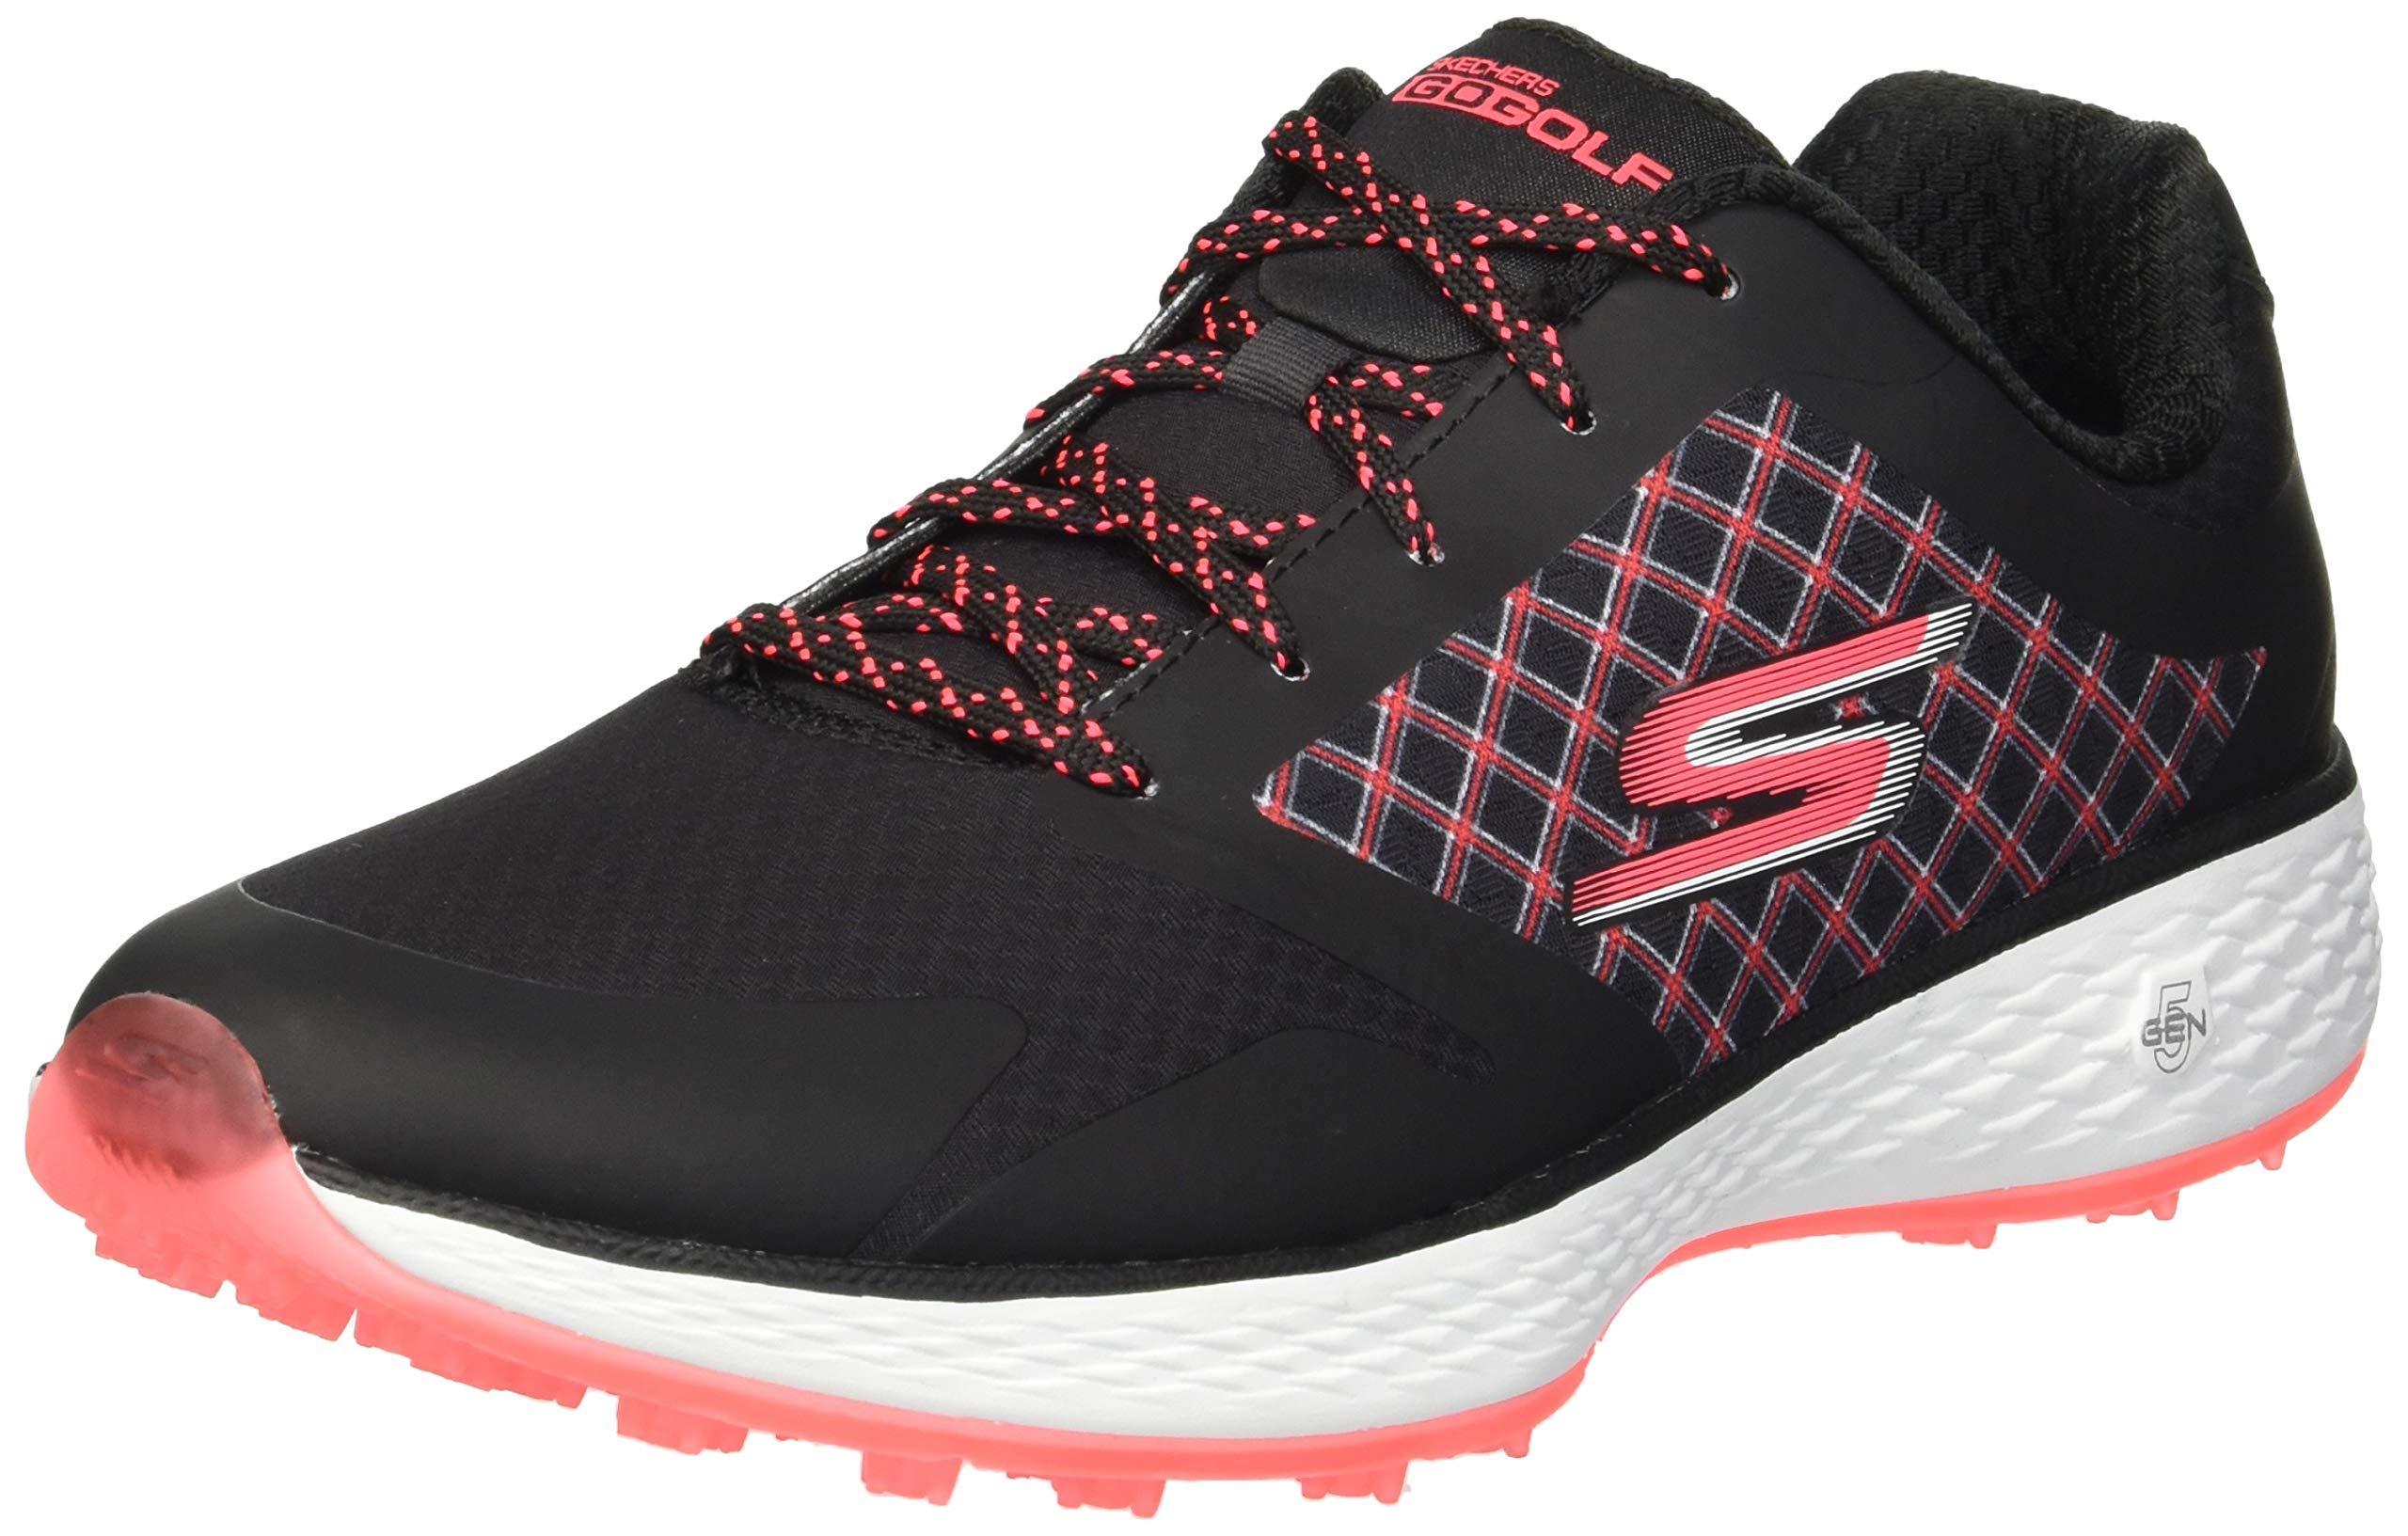 Skechers Golf Women's Go Eagle Major Shoe, Black/hot Pink, 11 M US